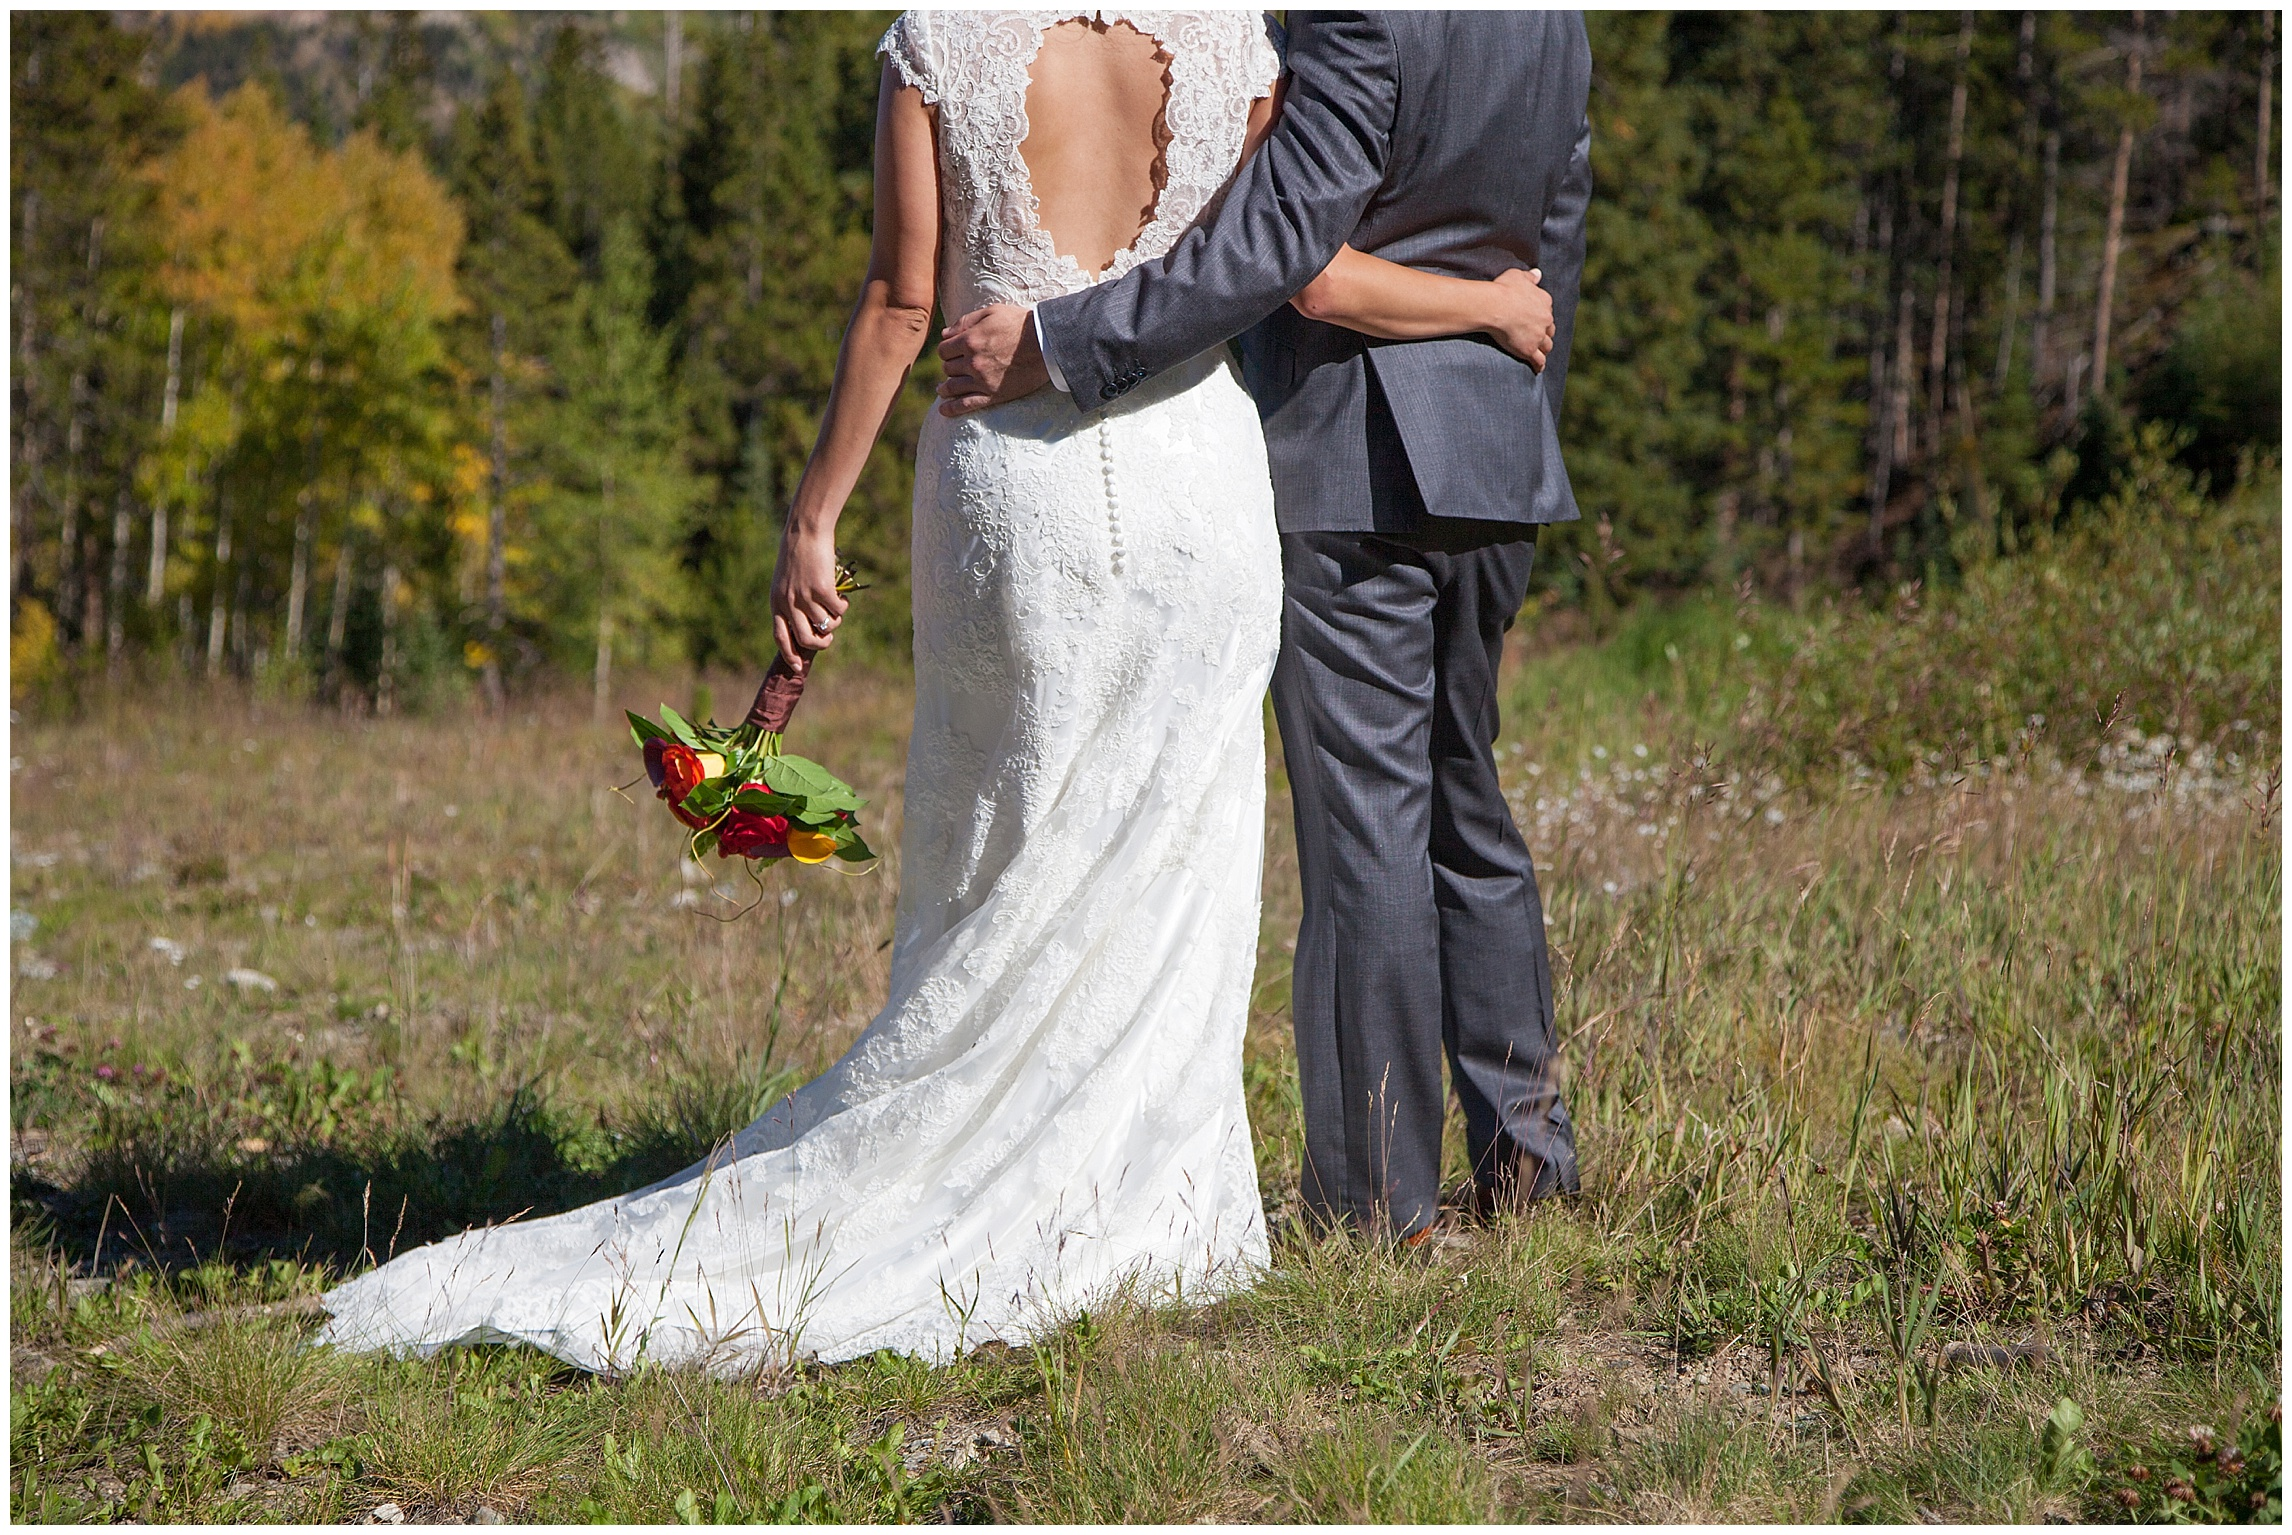 Mountain Wedding Bride and Groom | Sonja K. Photography | Ten Mile Station Breckenridge Colorado